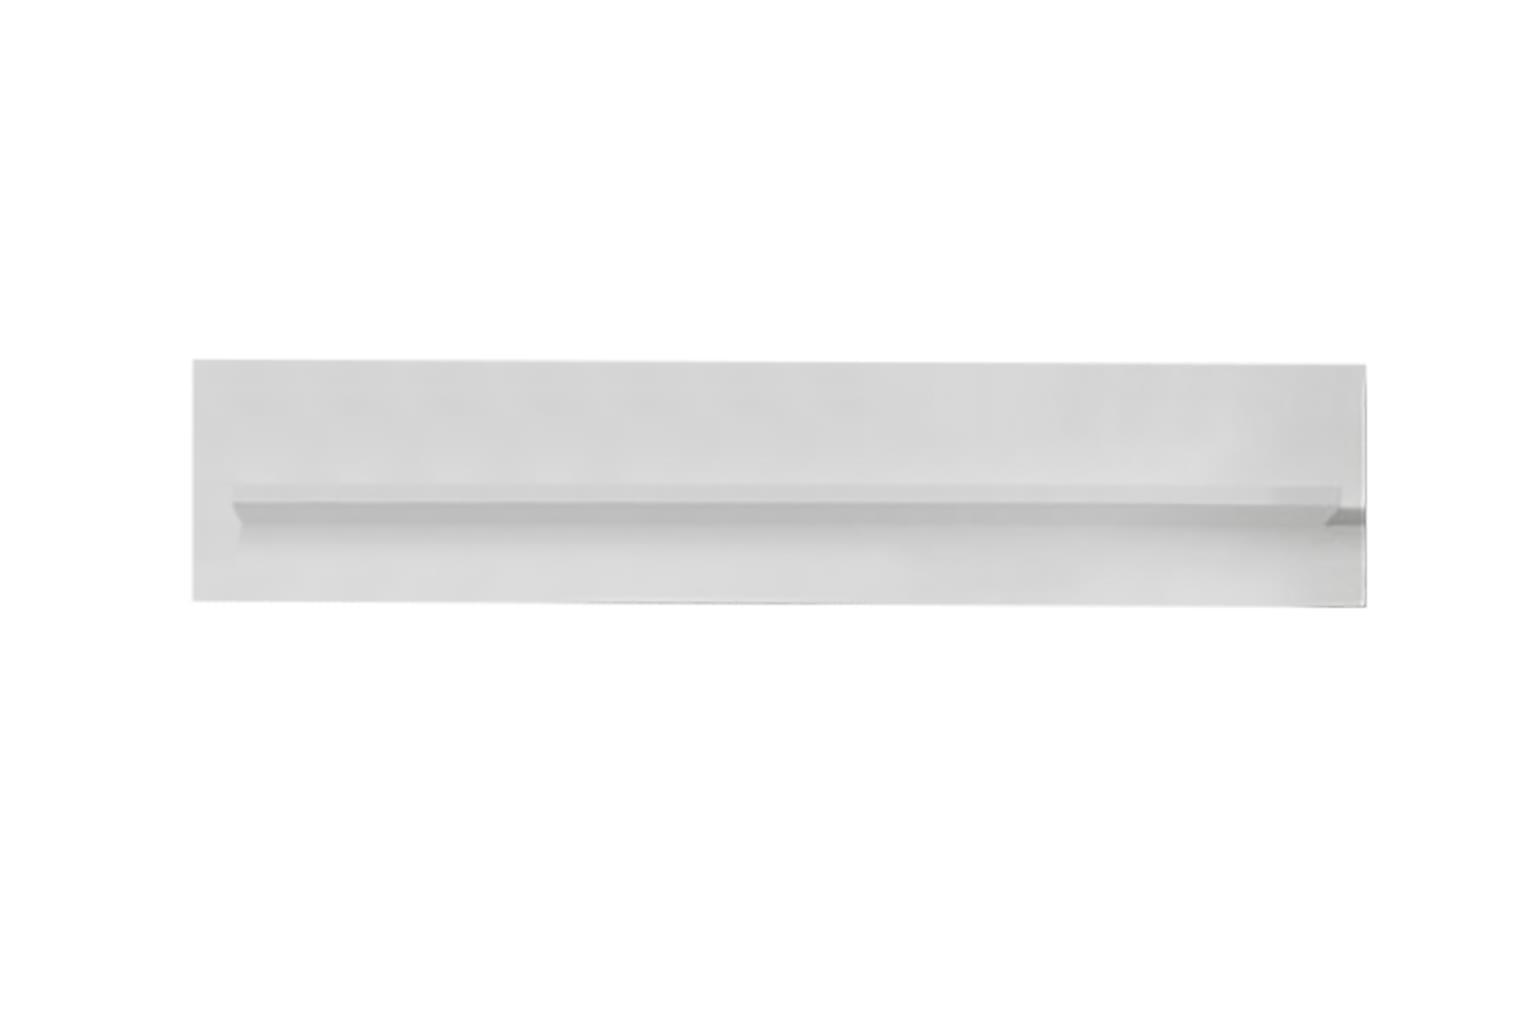 MAGGIORA Hylly 139 Valkoinen